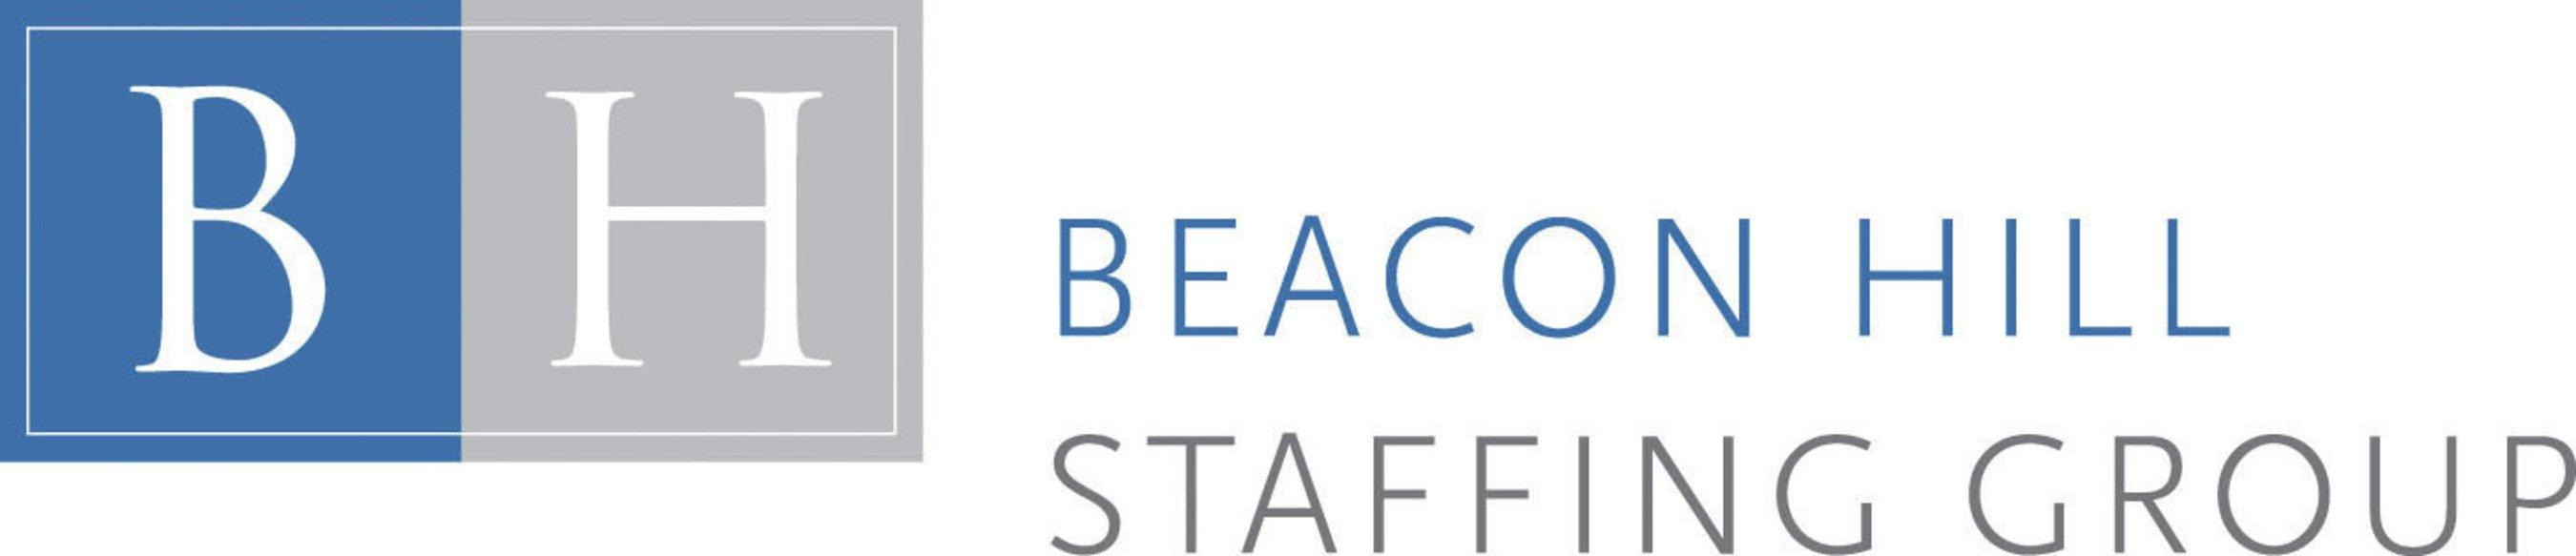 beacon-hill-staffing-logo.jpeg